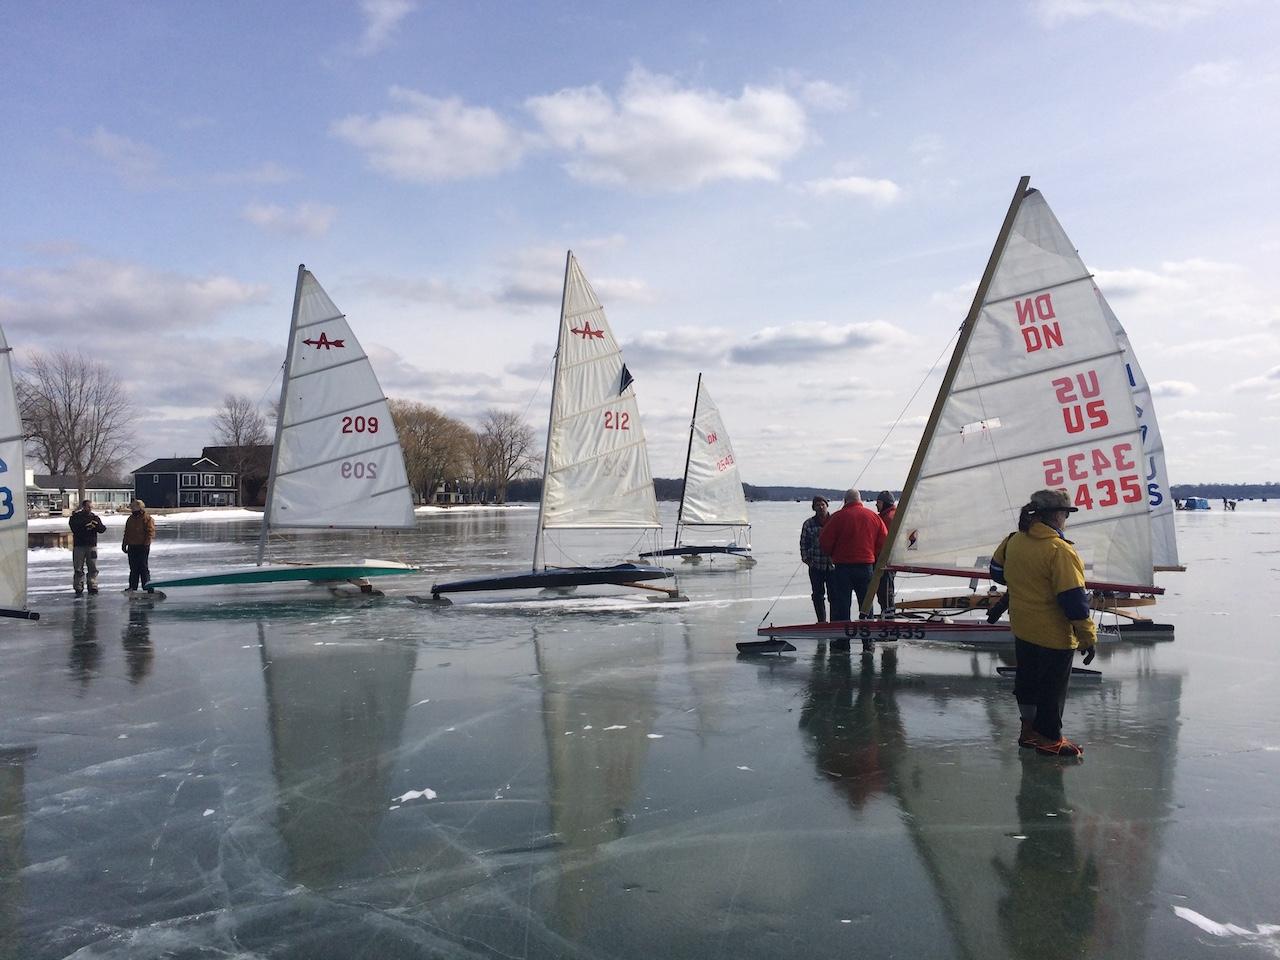 Ice sailing on Lake Ontario (photo)